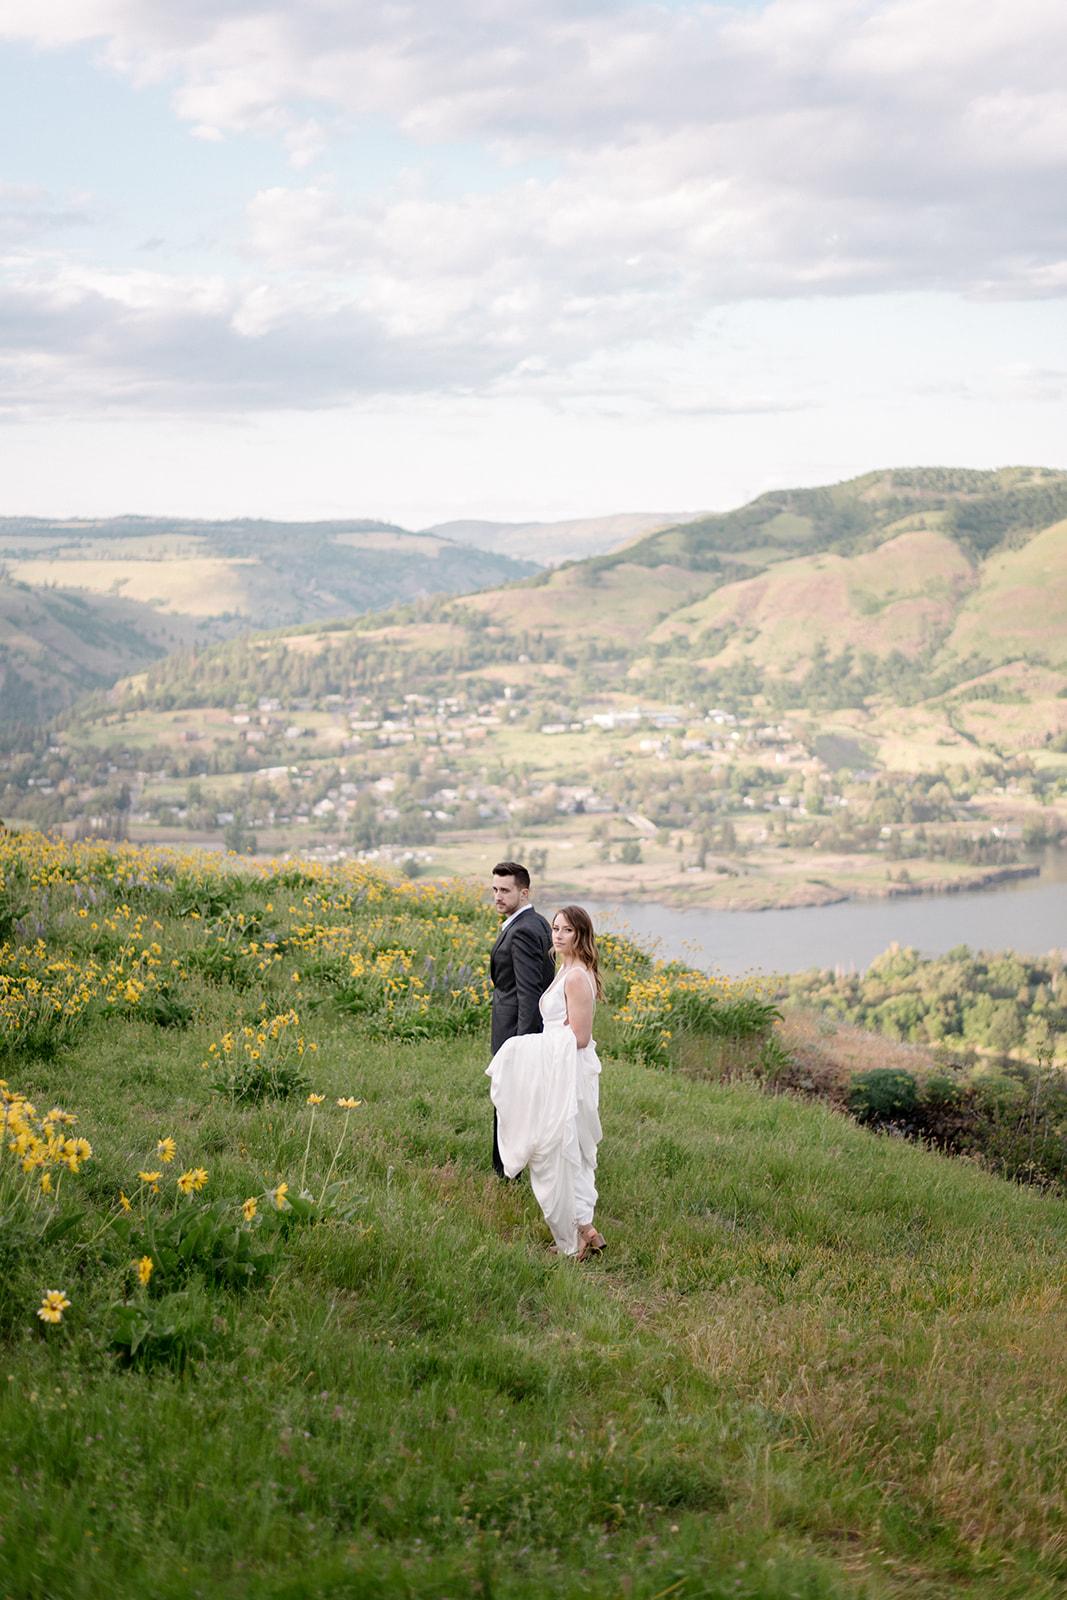 kamea_events_wedding_planner_portland_DeusAmor61.jpg